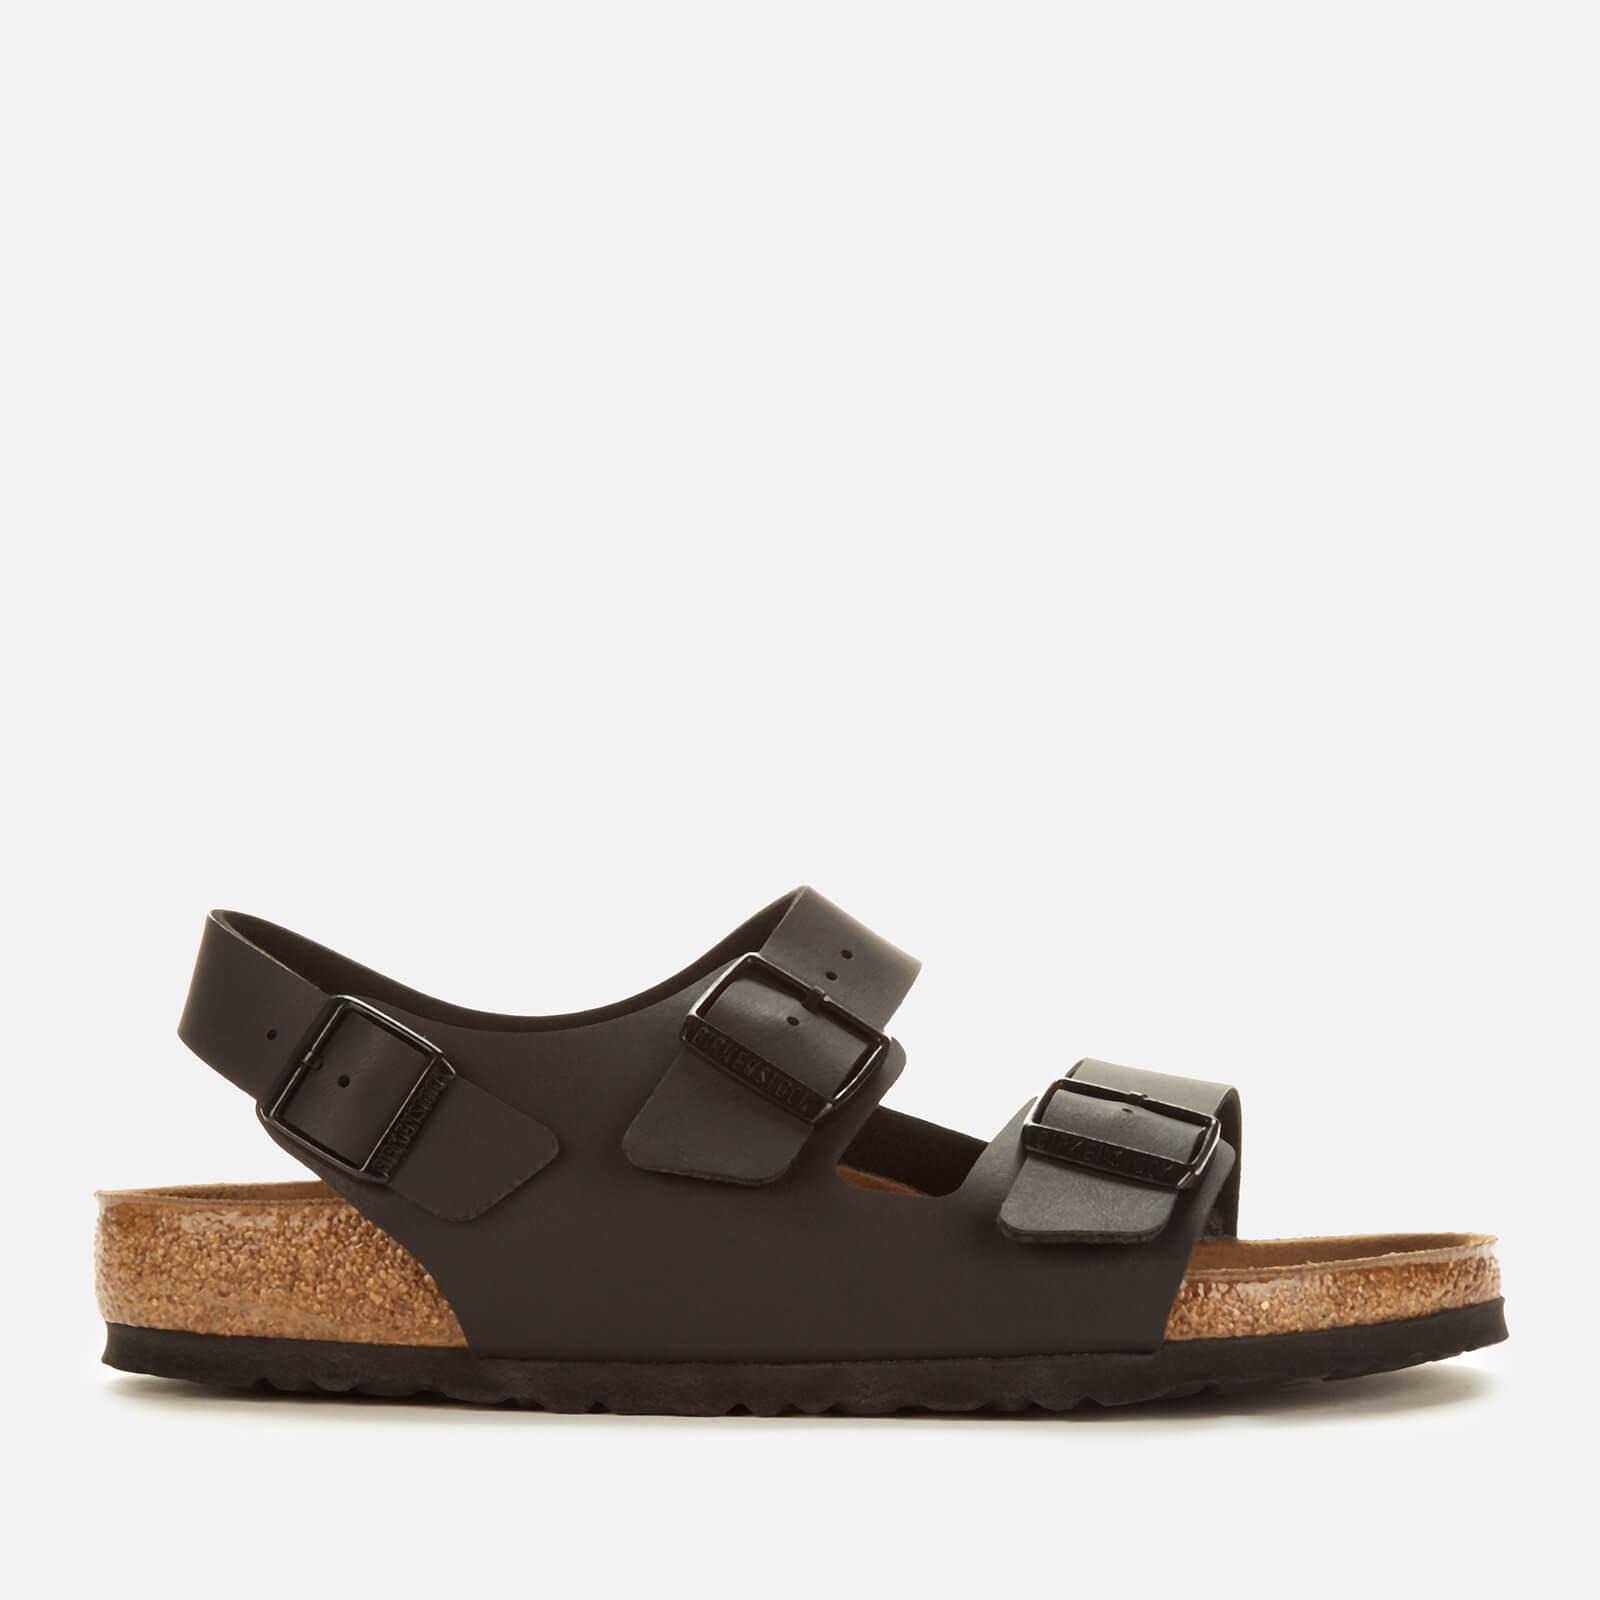 Birkenstock Men's Milano Double Strap Sandals - Black - EU 41/UK 7.5